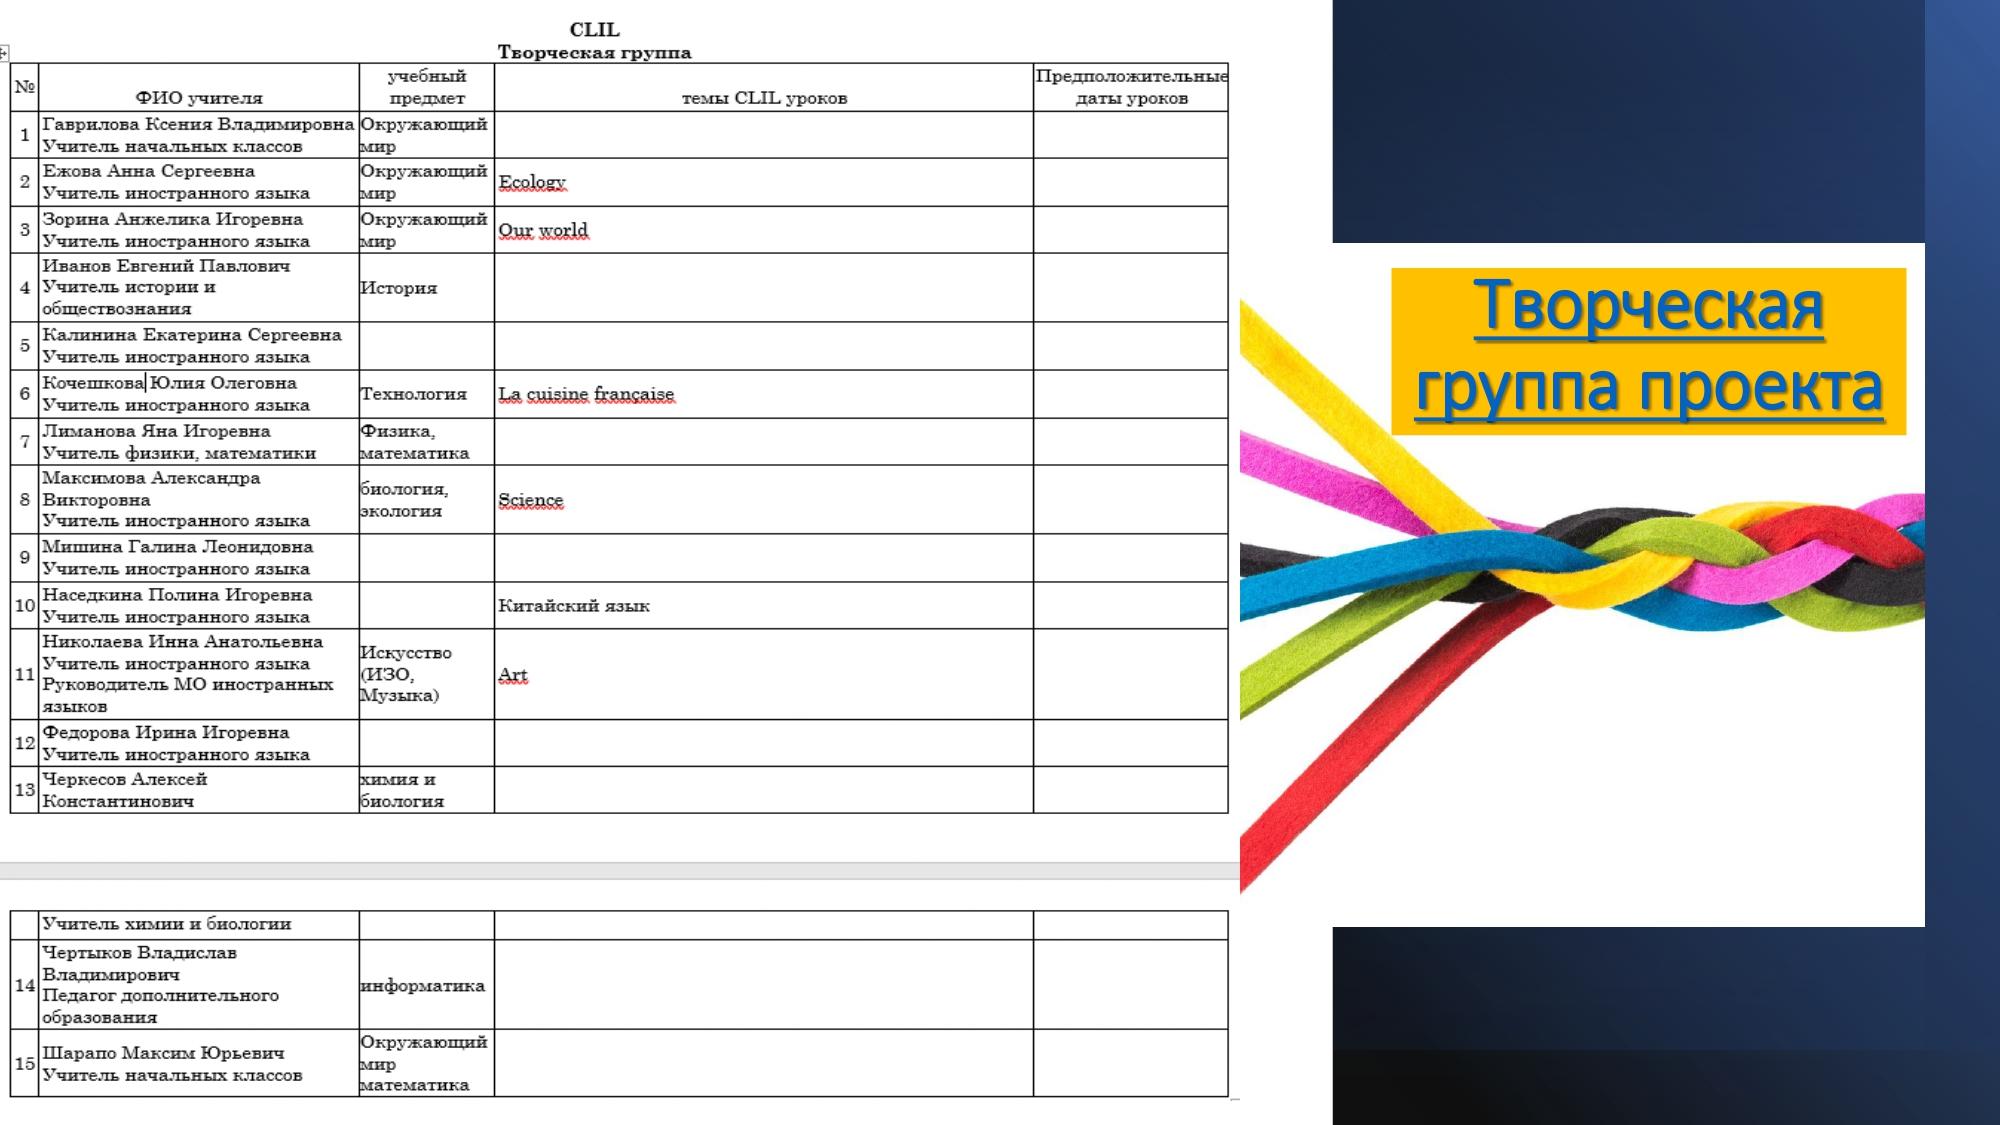 CLIL ПРОЕКТ_page-0019